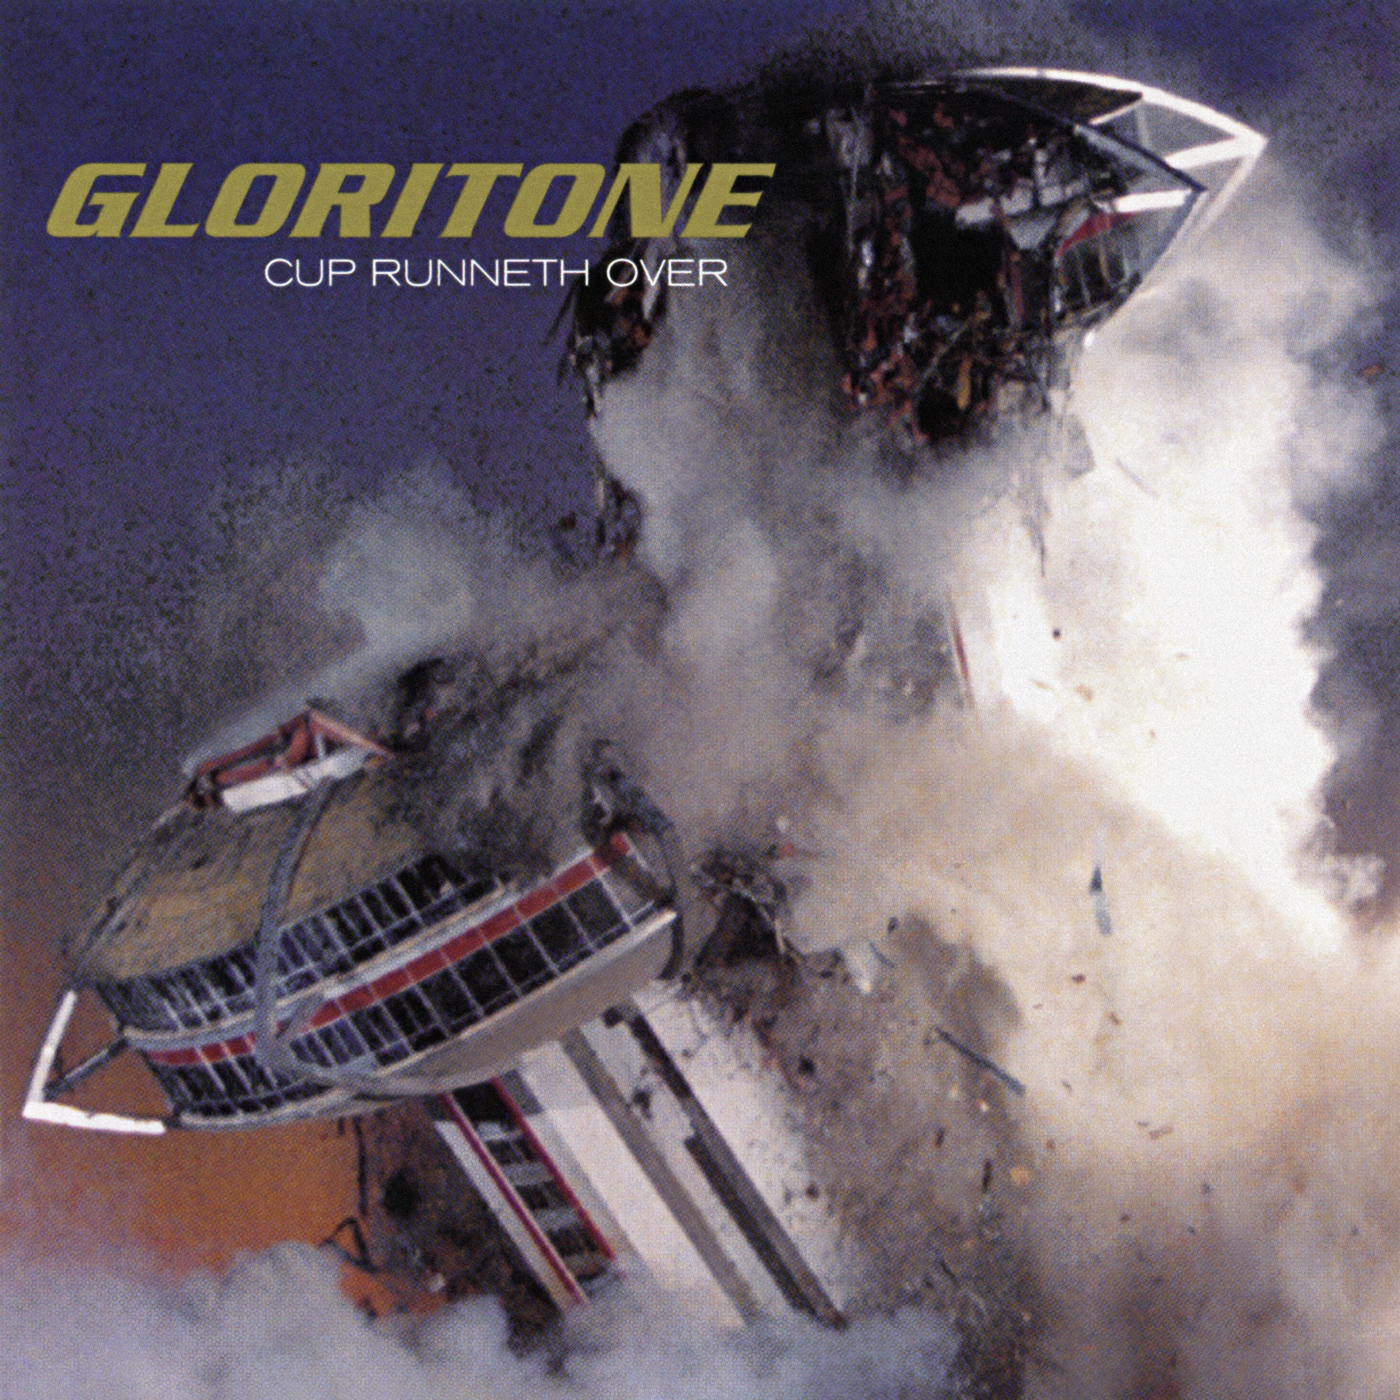 Cup Runneth Over - Gloritone